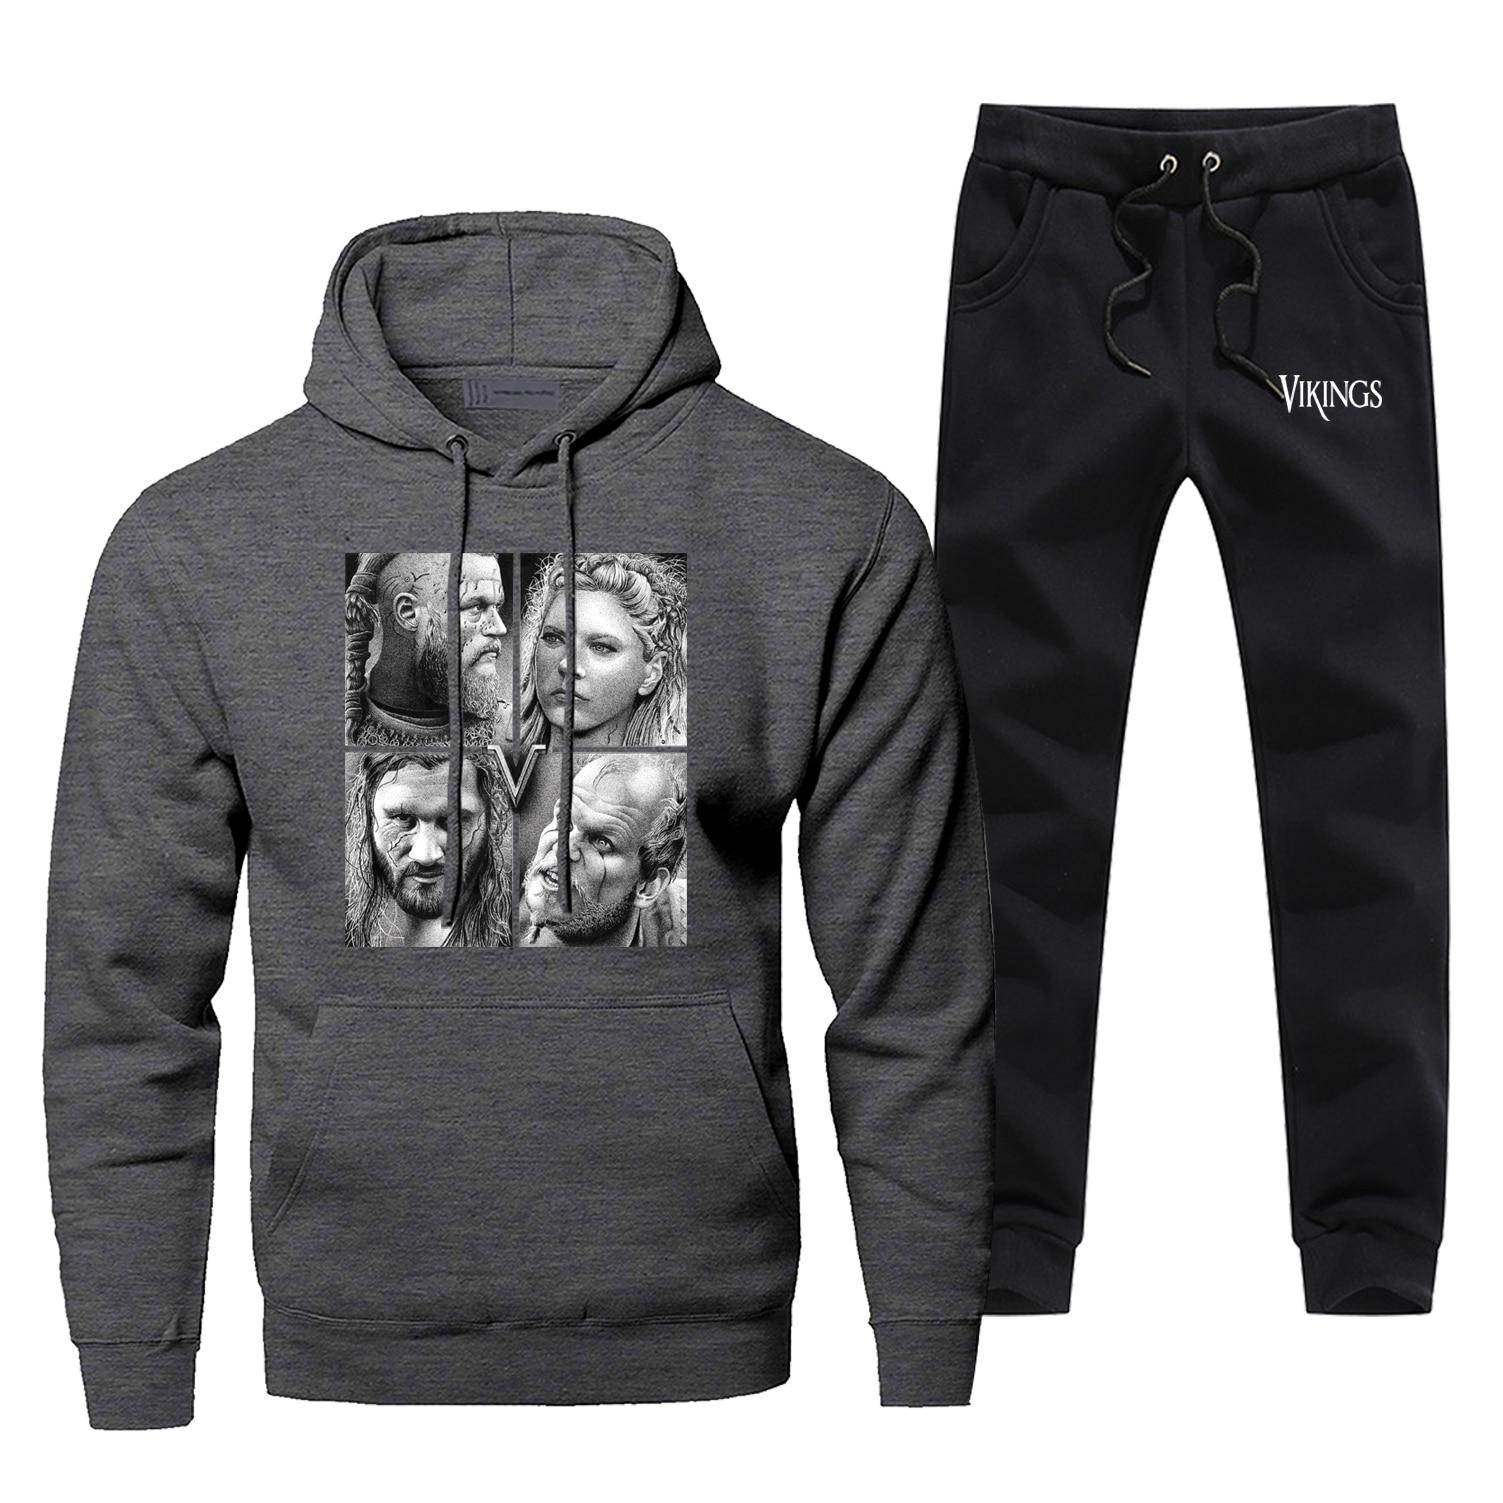 Odin Vikings Mens Hoodies Sets Two Piece Pant Odins Viking Hoodie Sweatshirt Sweatpants Streetwear Sportswear Male Sweatshirts